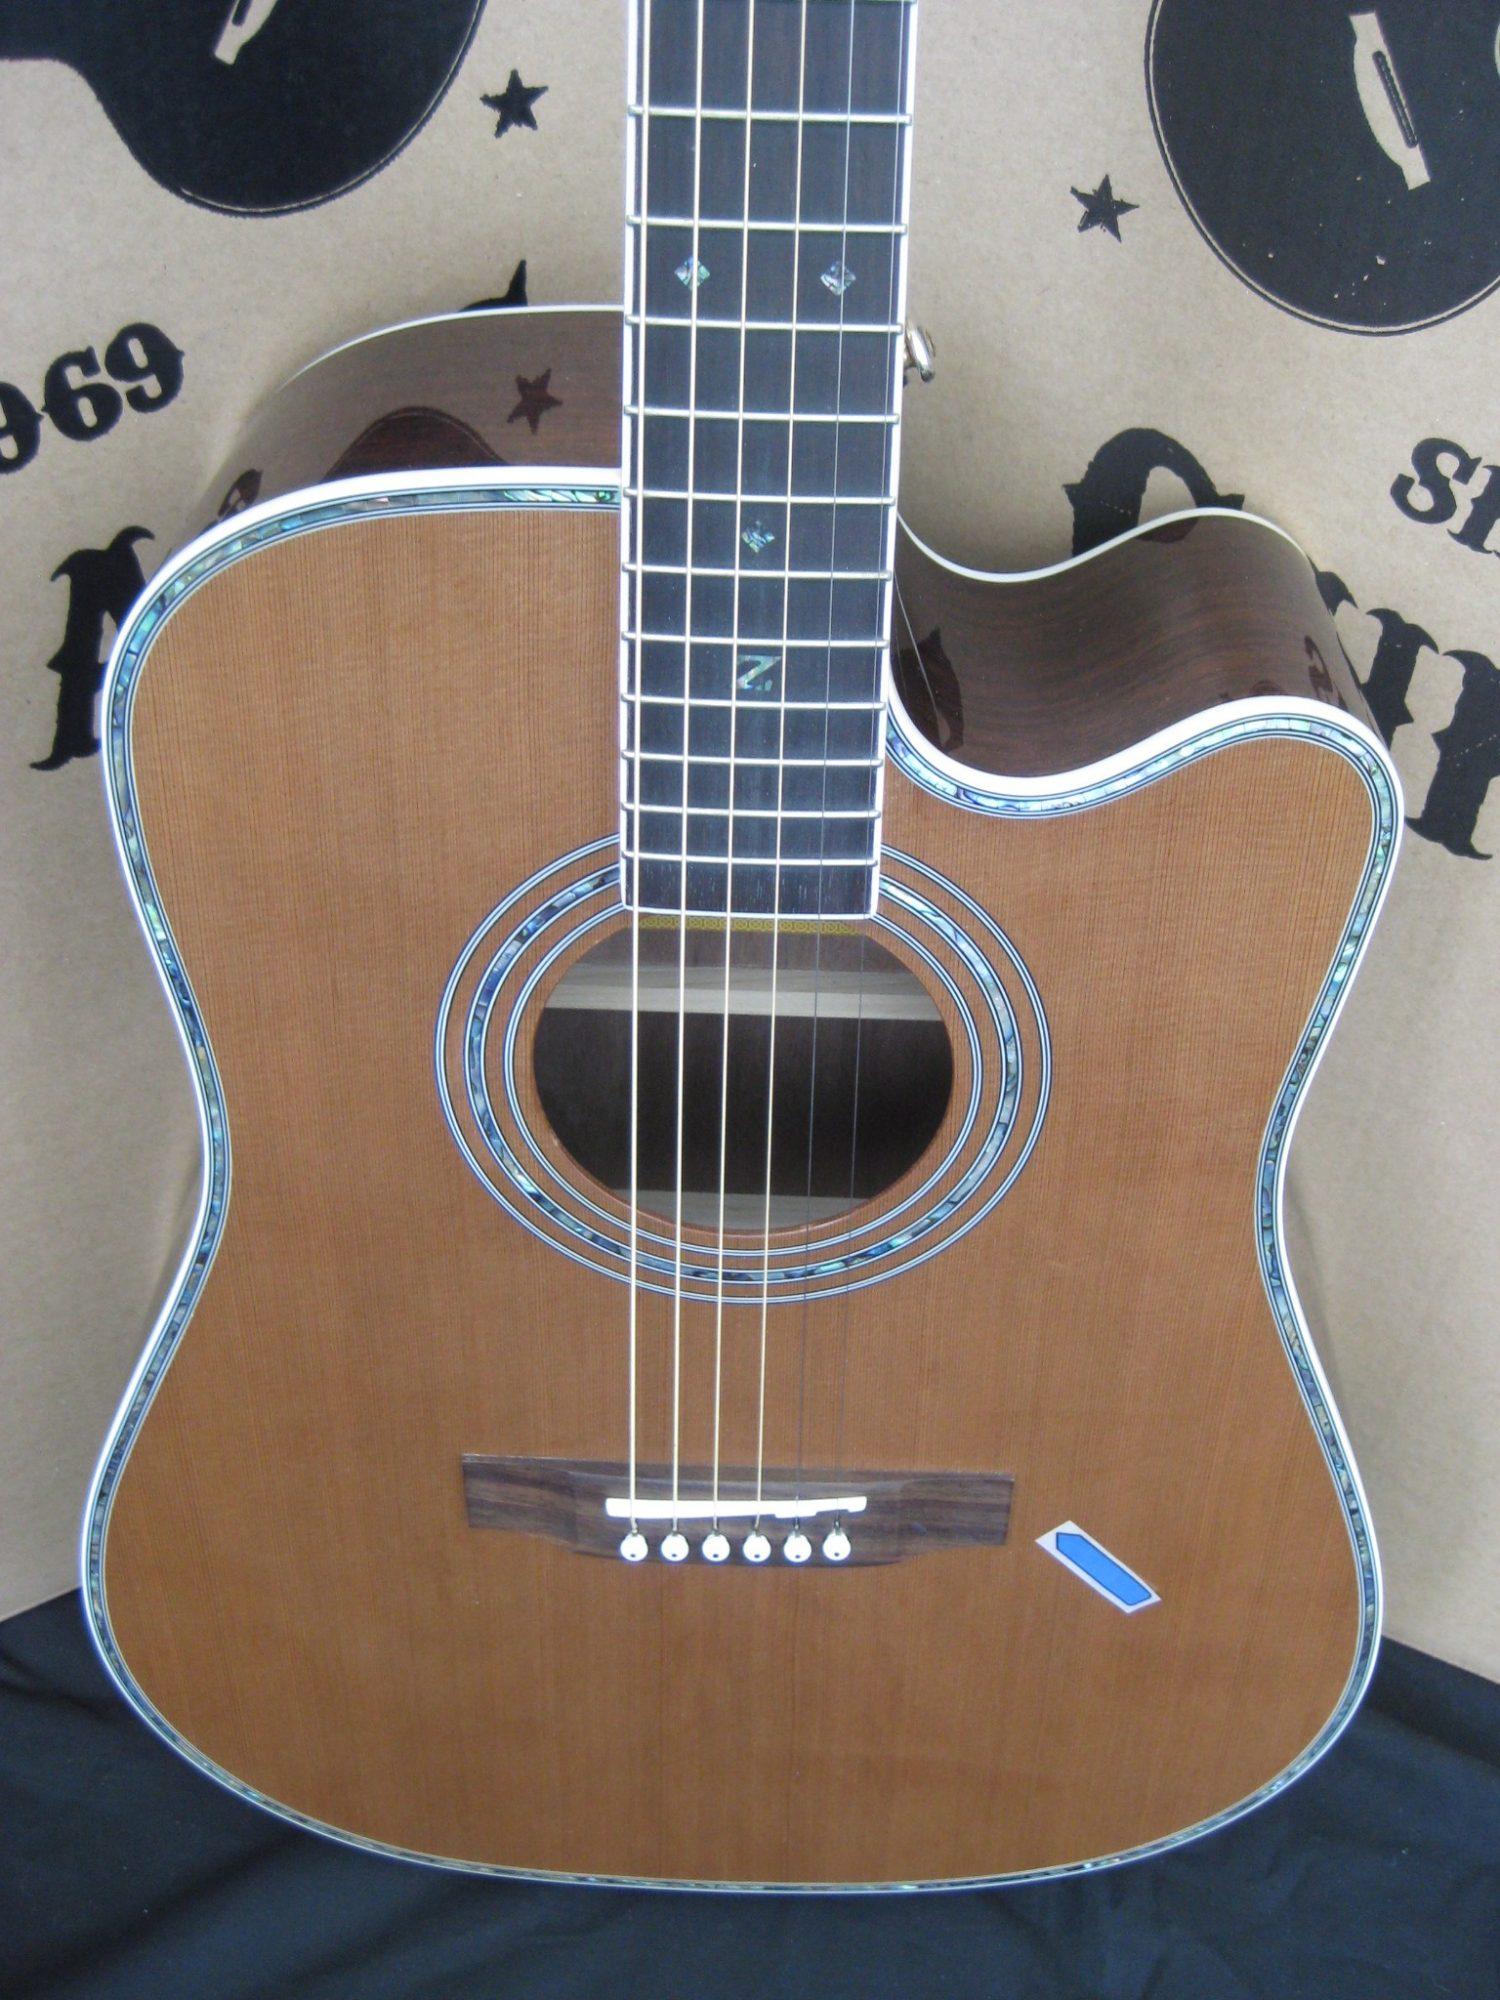 1769 80ce acoustic electric discount guitar zager guitars. Black Bedroom Furniture Sets. Home Design Ideas